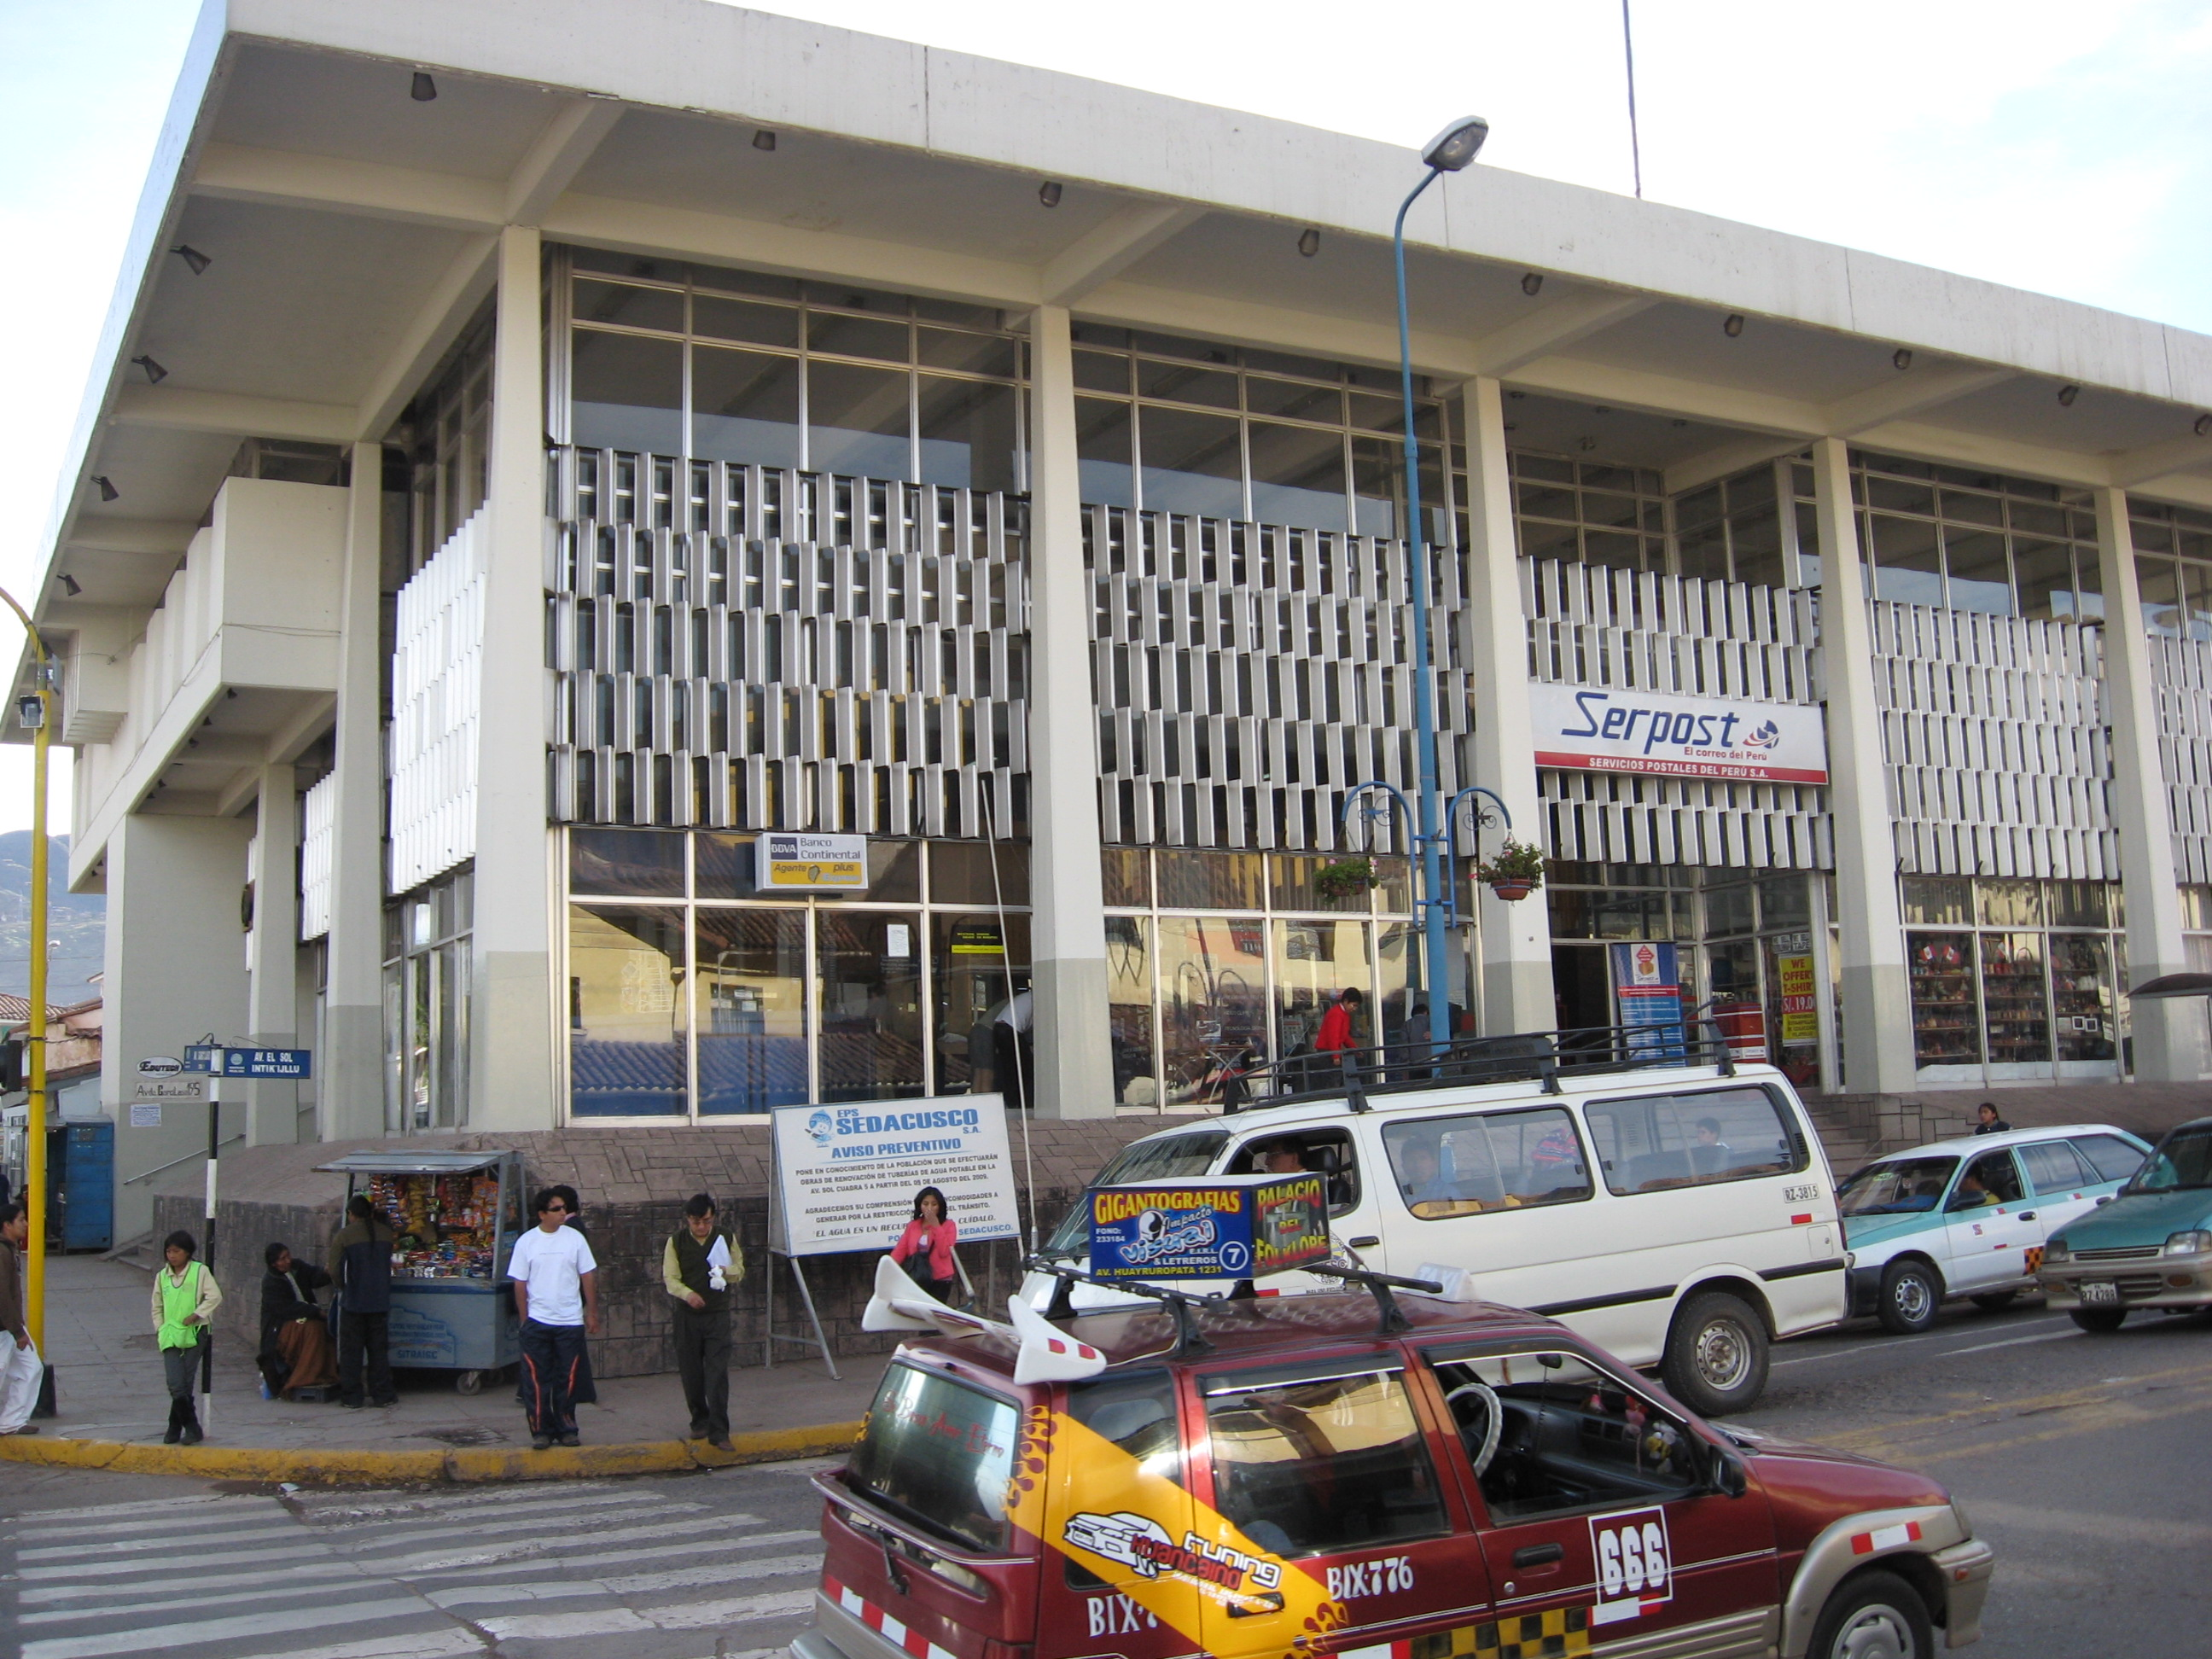 Cuzco post office